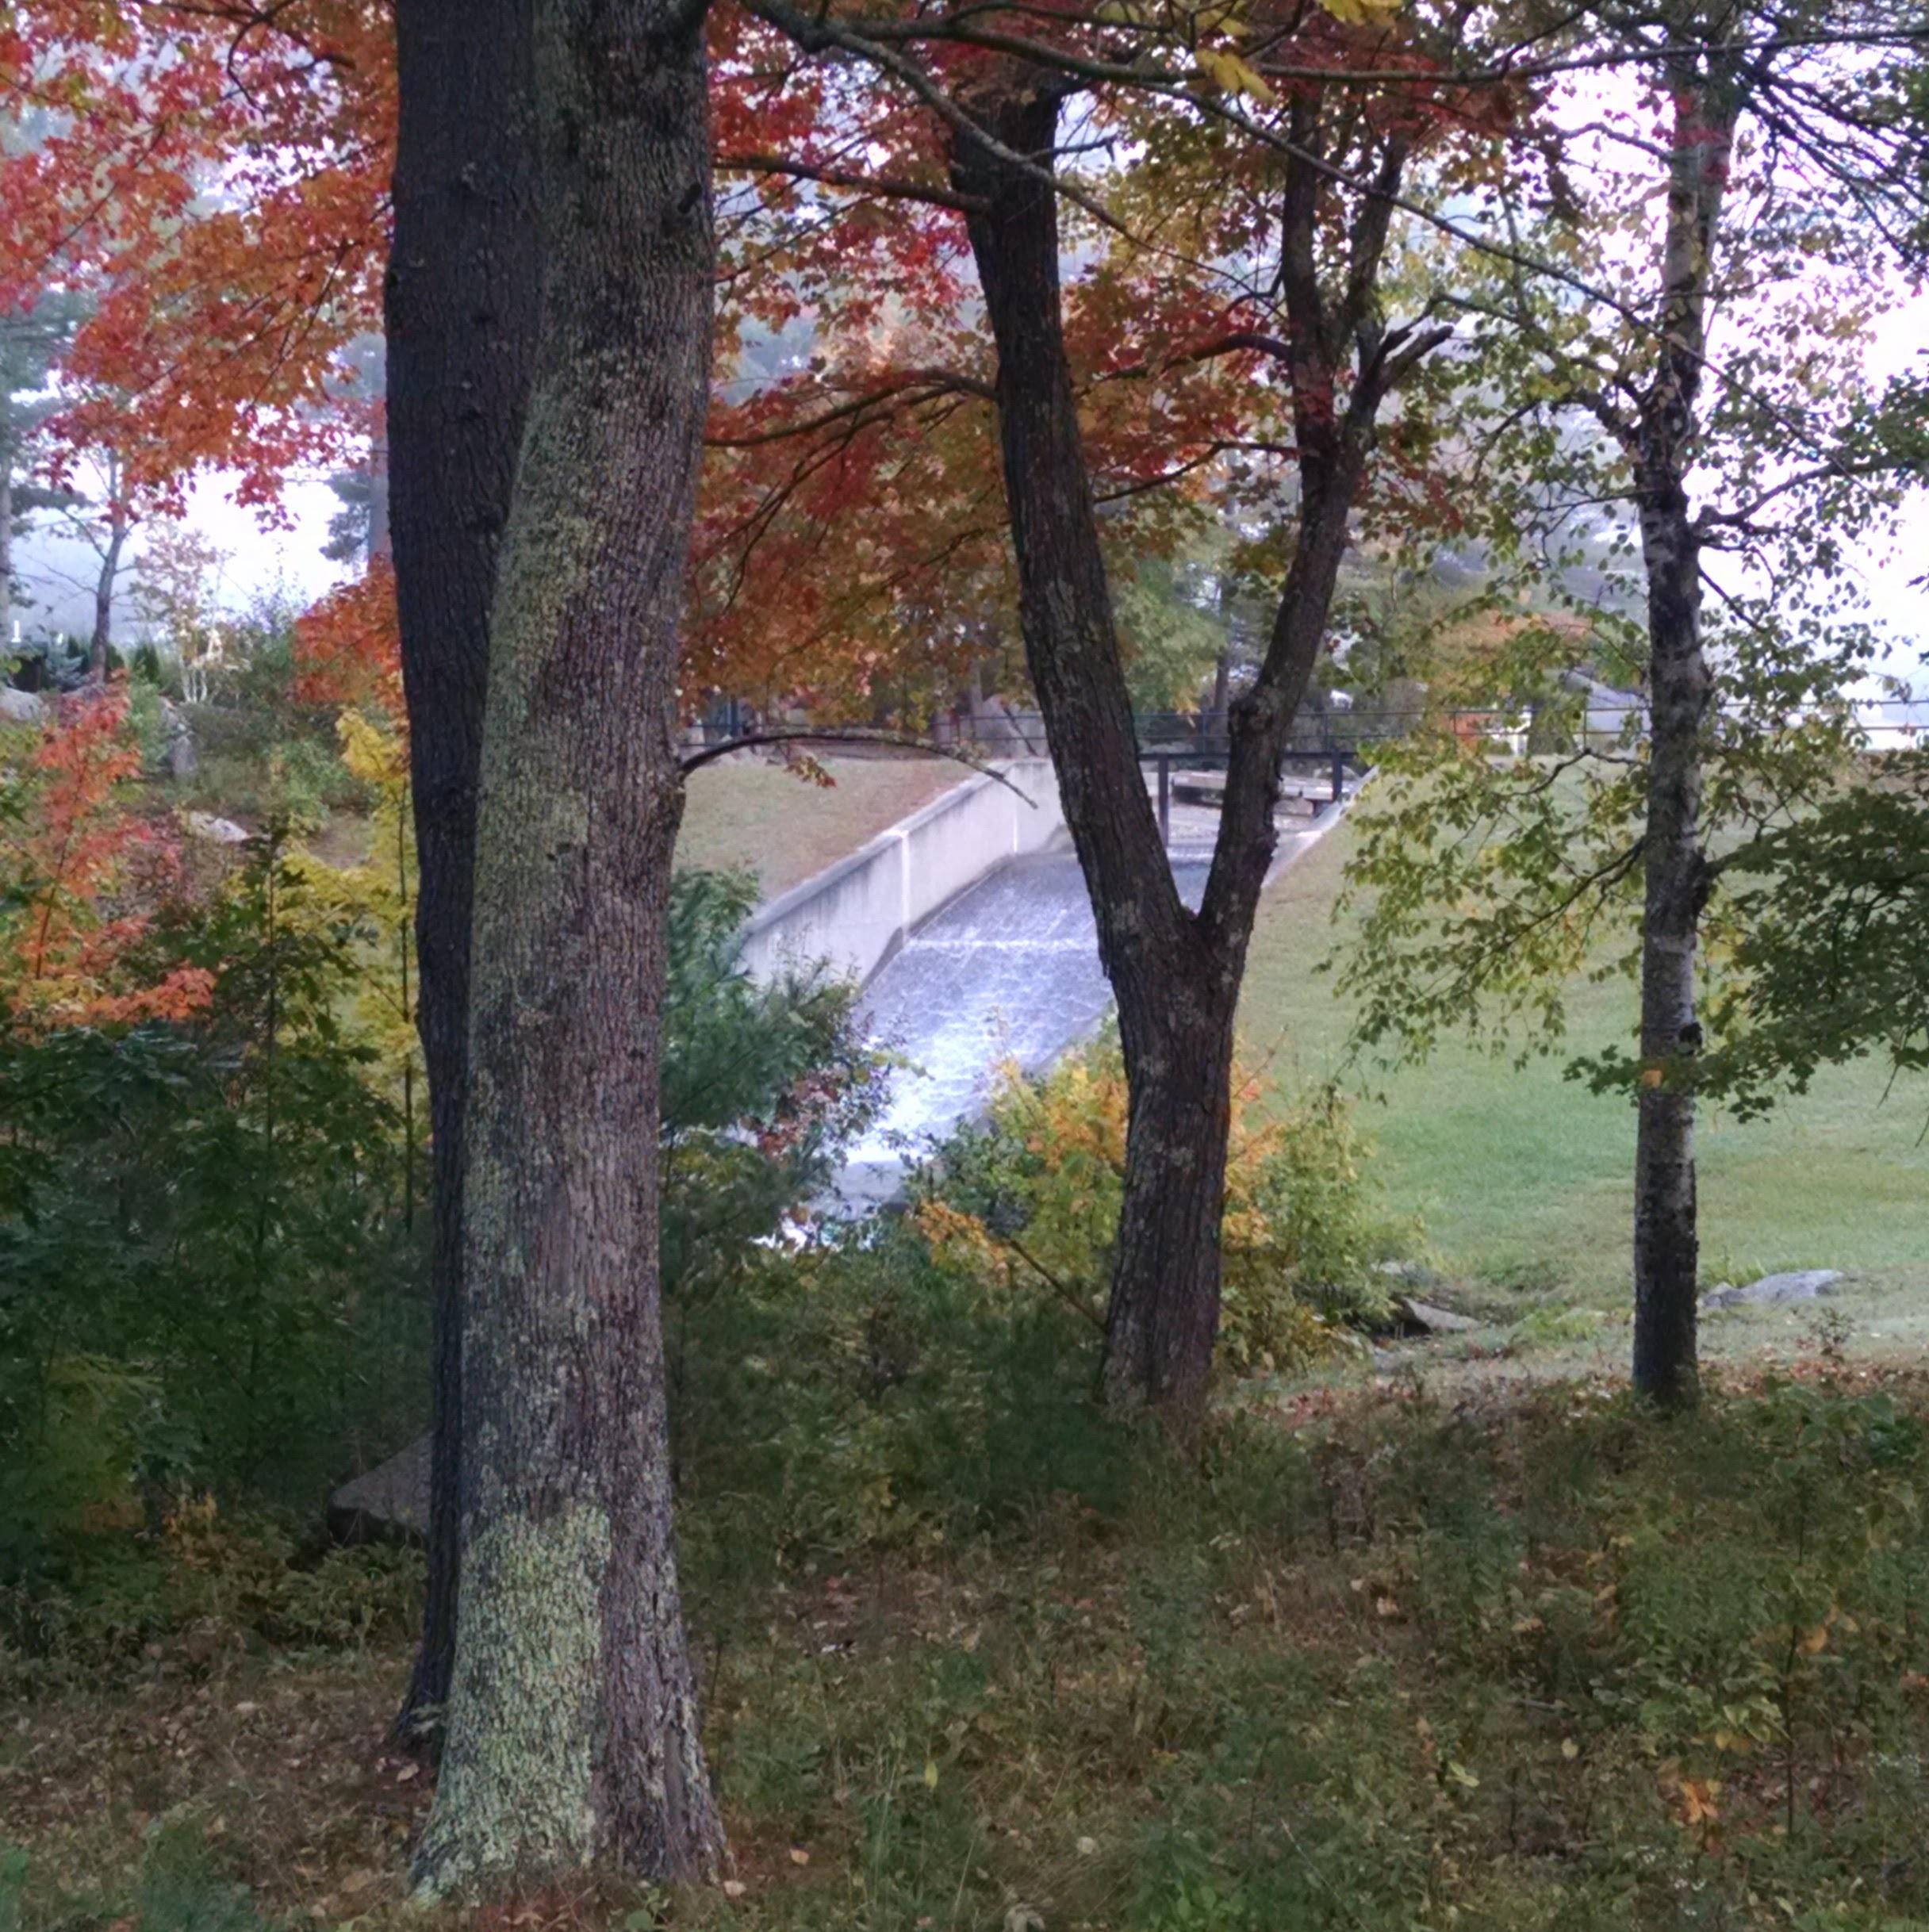 The dam again...as spied through the trees.